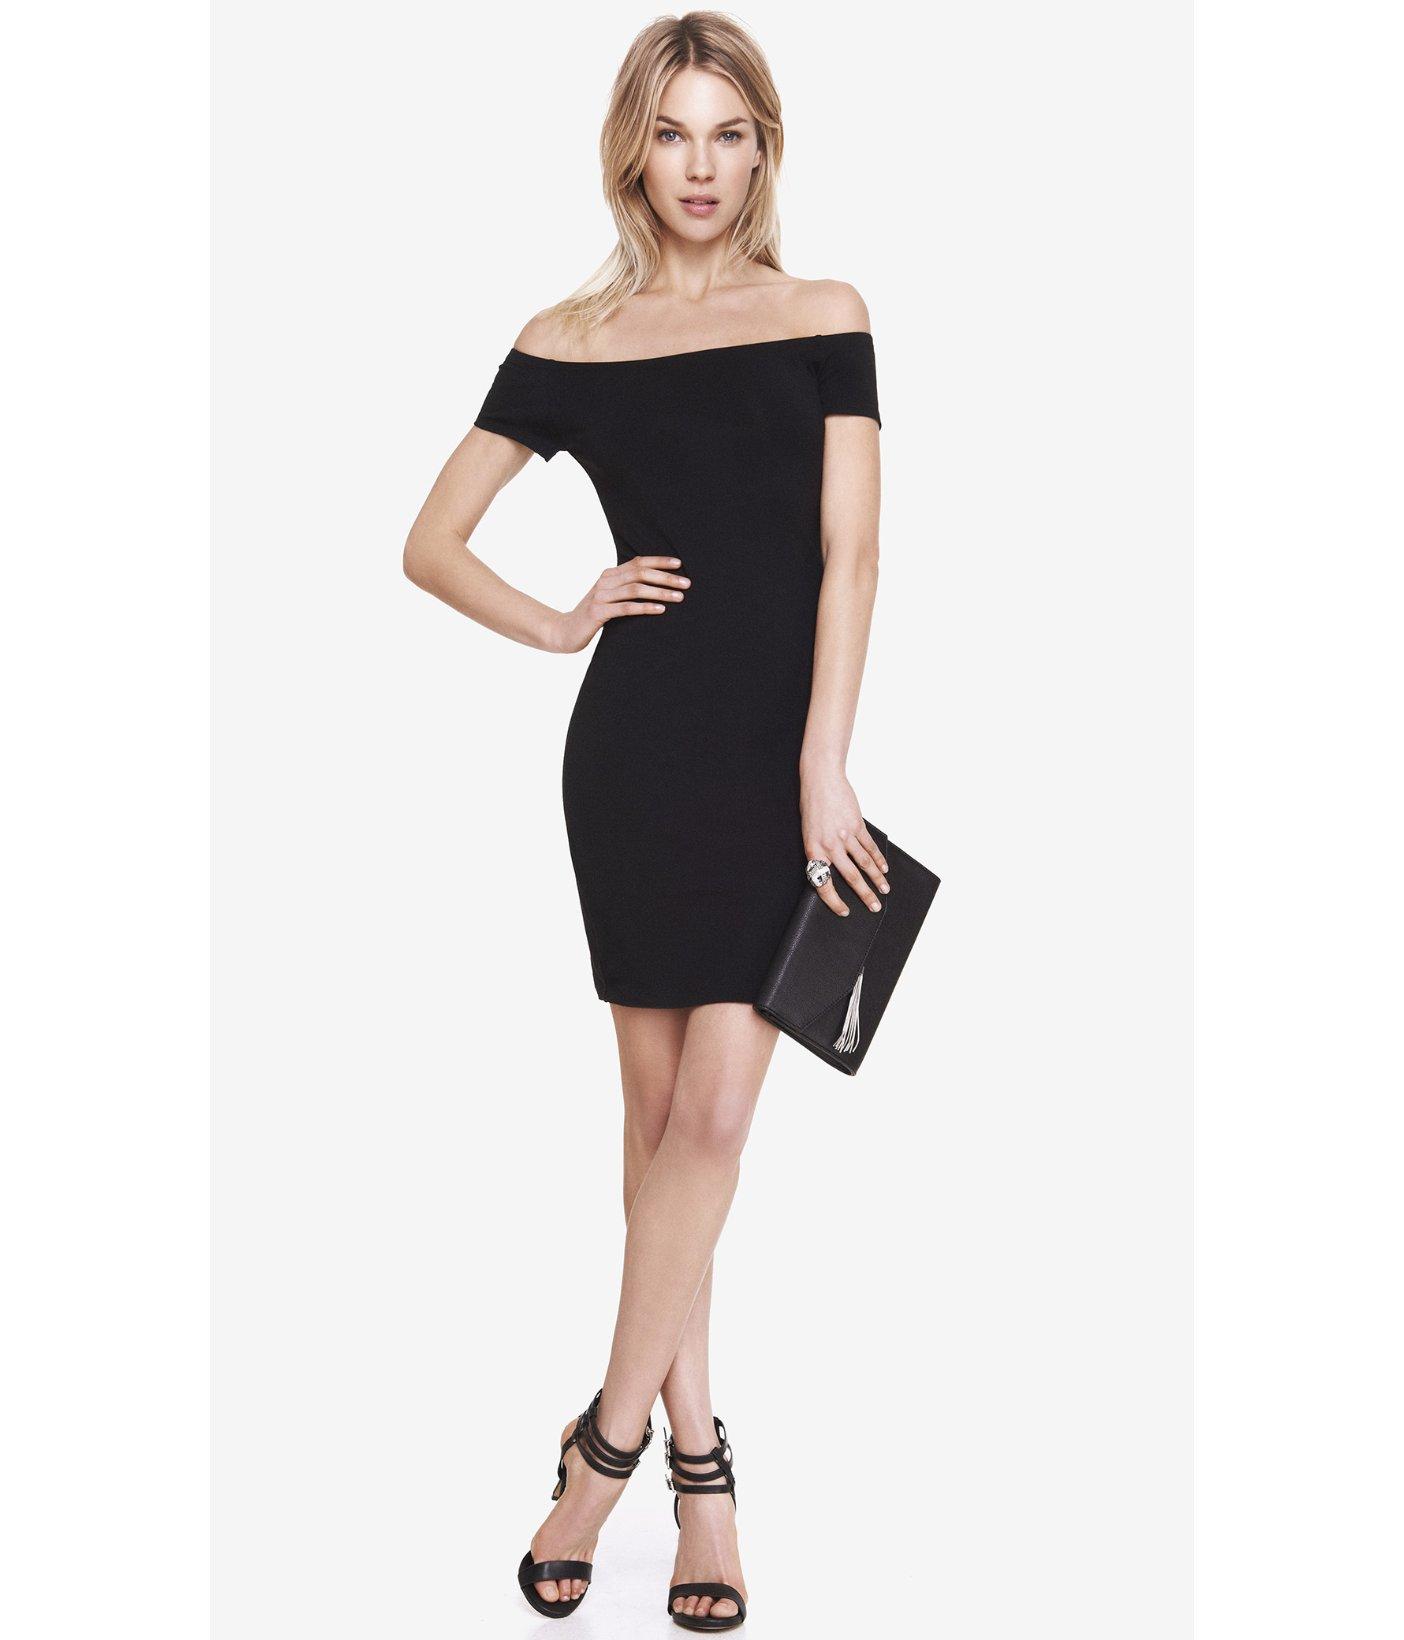 6f9398affa38 Lyst - Express Black Stretch Cotton Off The Shoulder Dress in Black